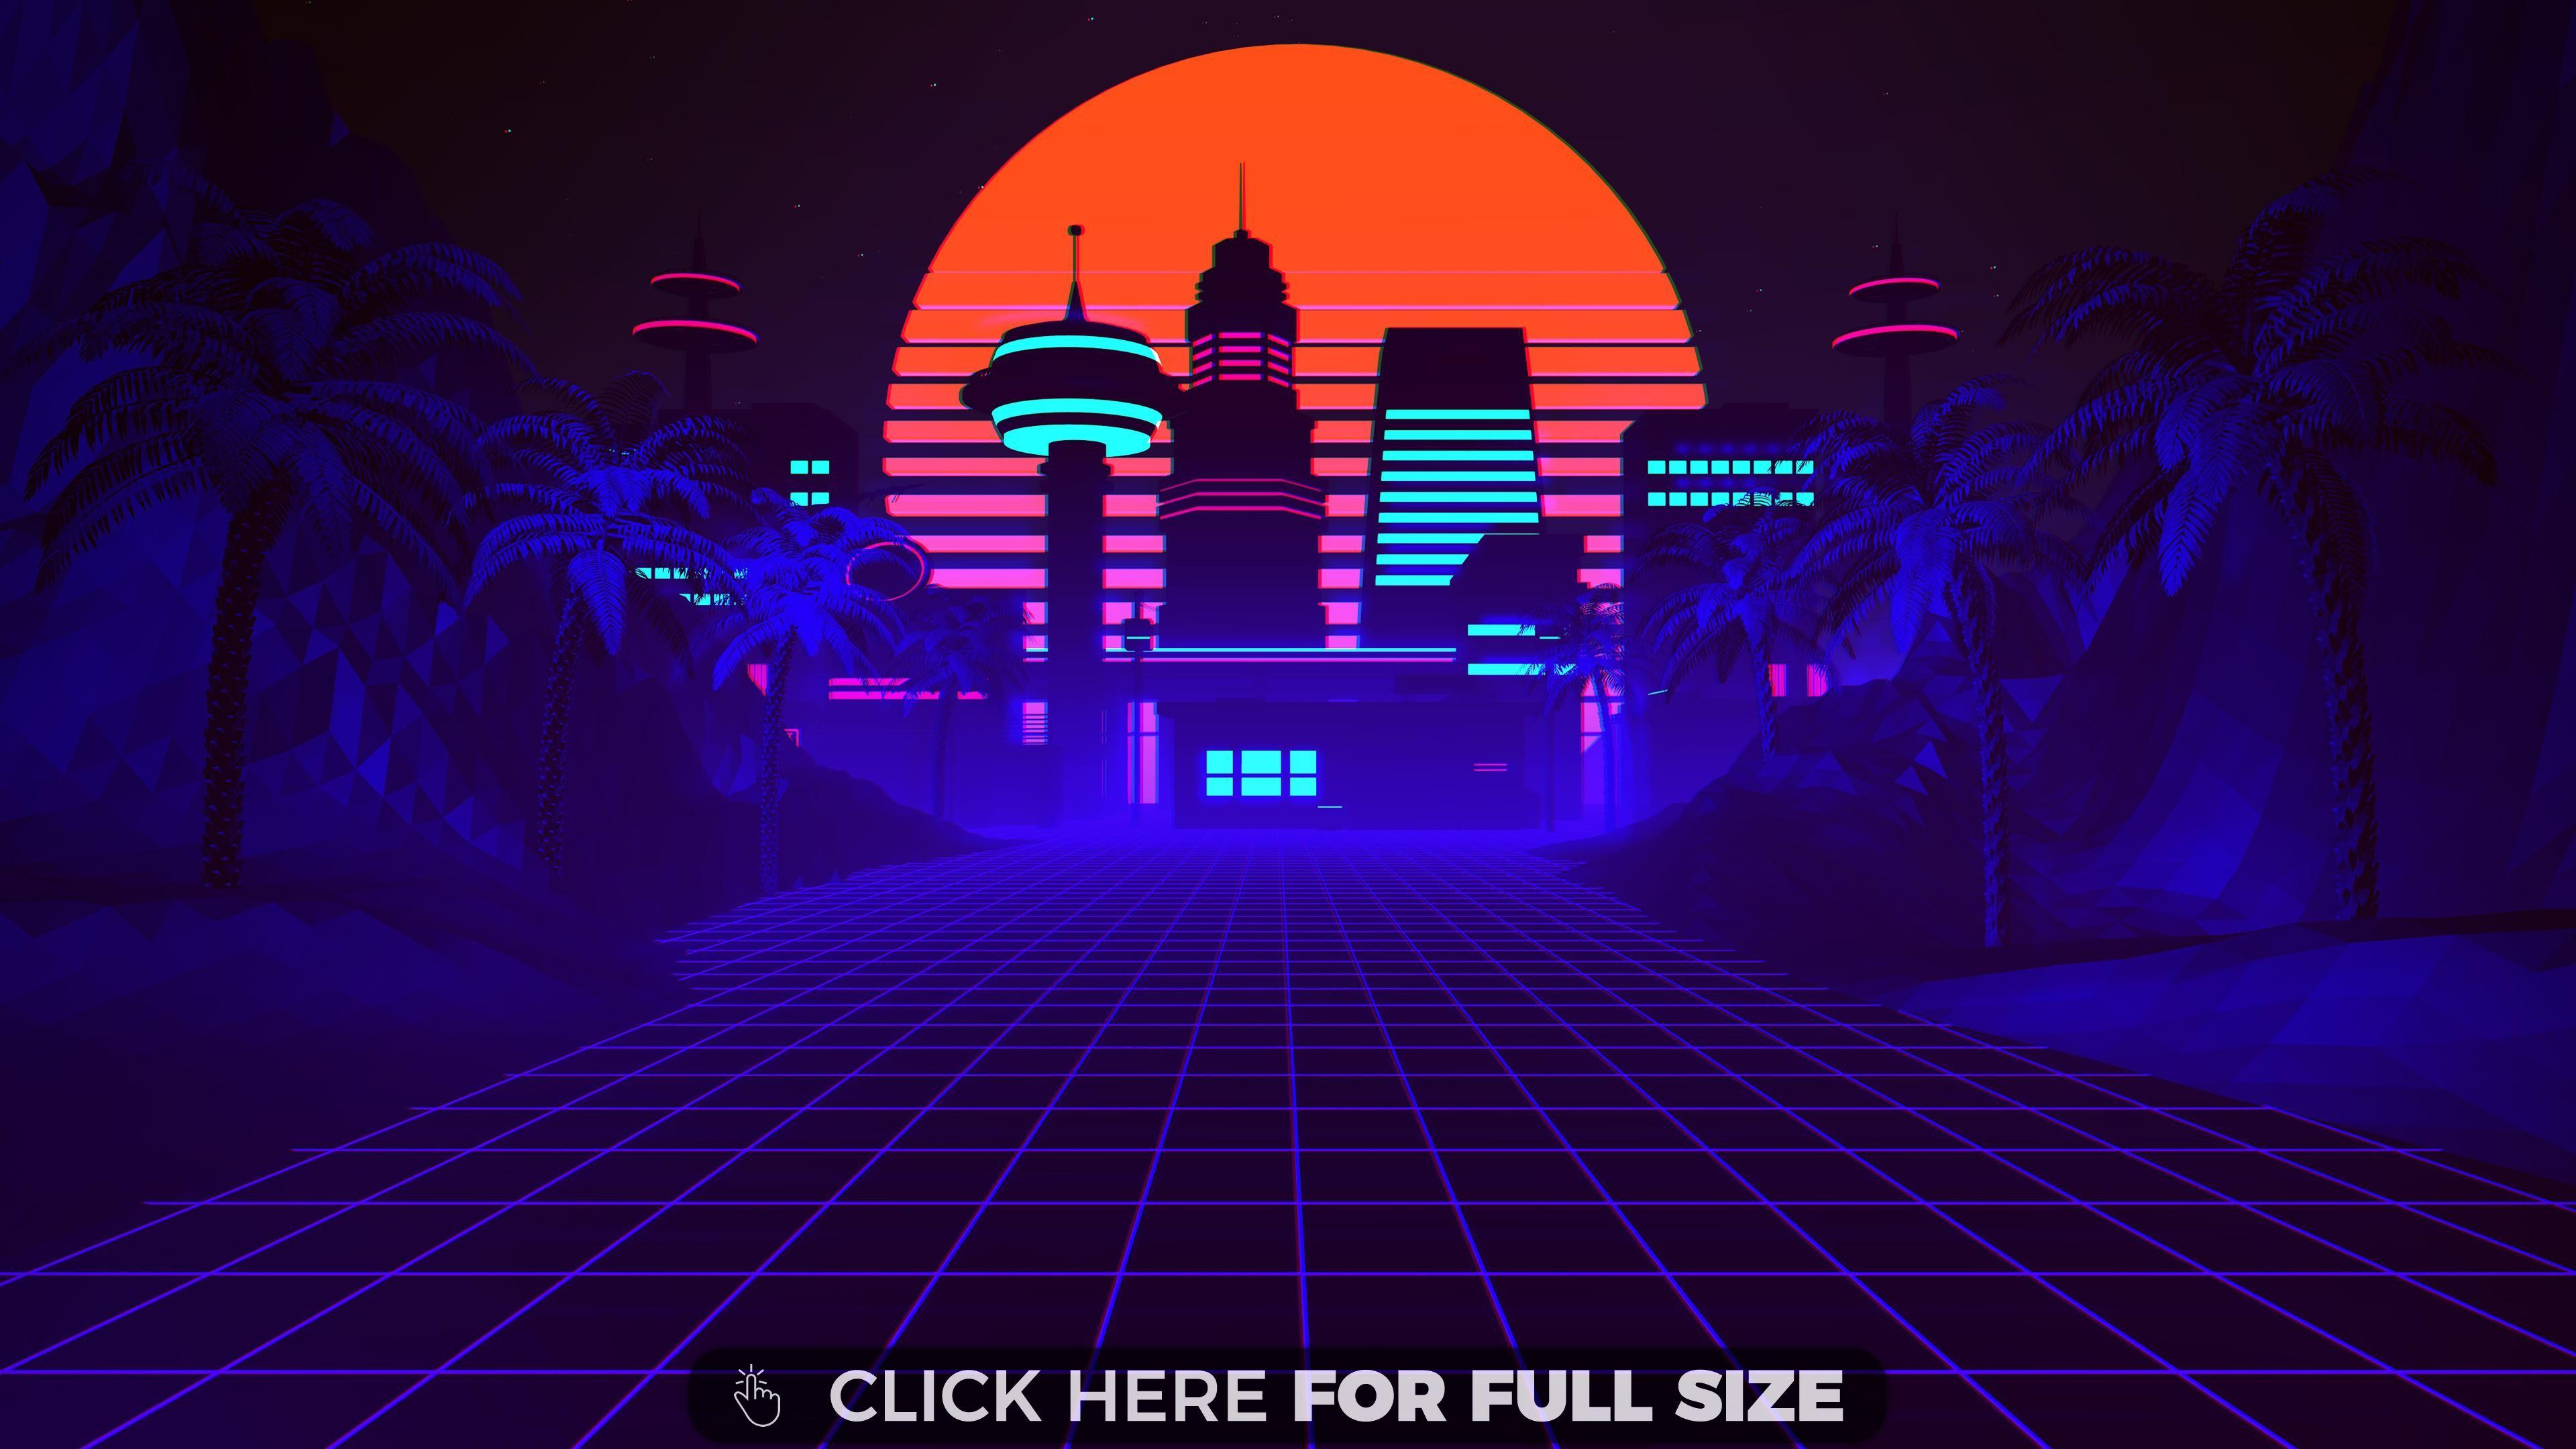 80s Synthwave And Retrowave Illustration Premium 4k Wallpaper Synthwave Retro Style Art Art Wallpaper